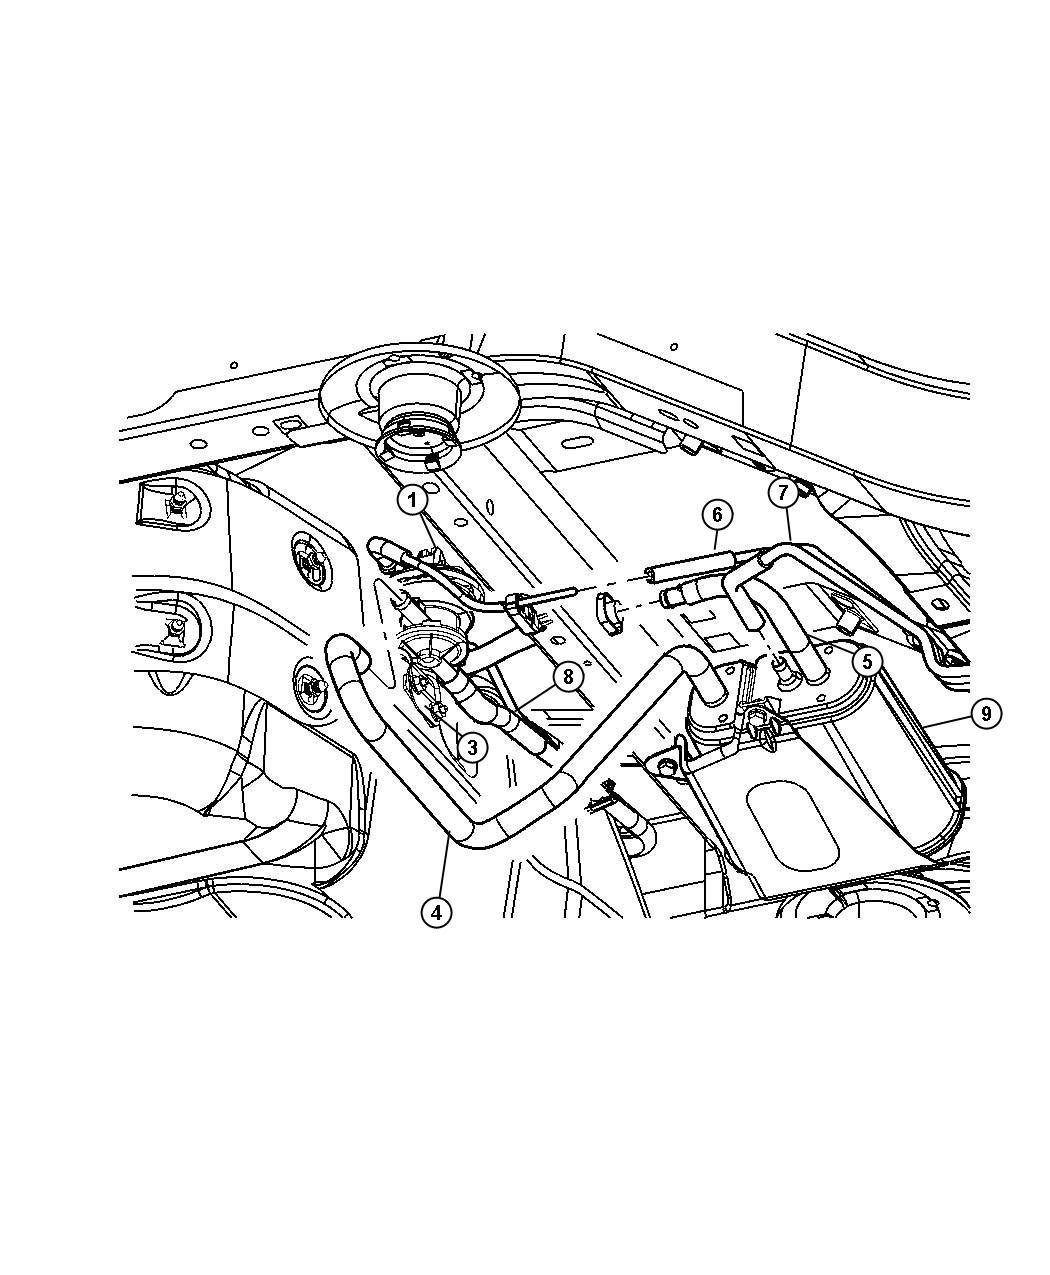 tags: #2004 jeep tj fuel filter#2009 jeep wrangler fuel filter#2000 jeep  wrangler fuel filter#1998 jeep wrangler fuel filter#2016 jeep wrangler fuel  filter